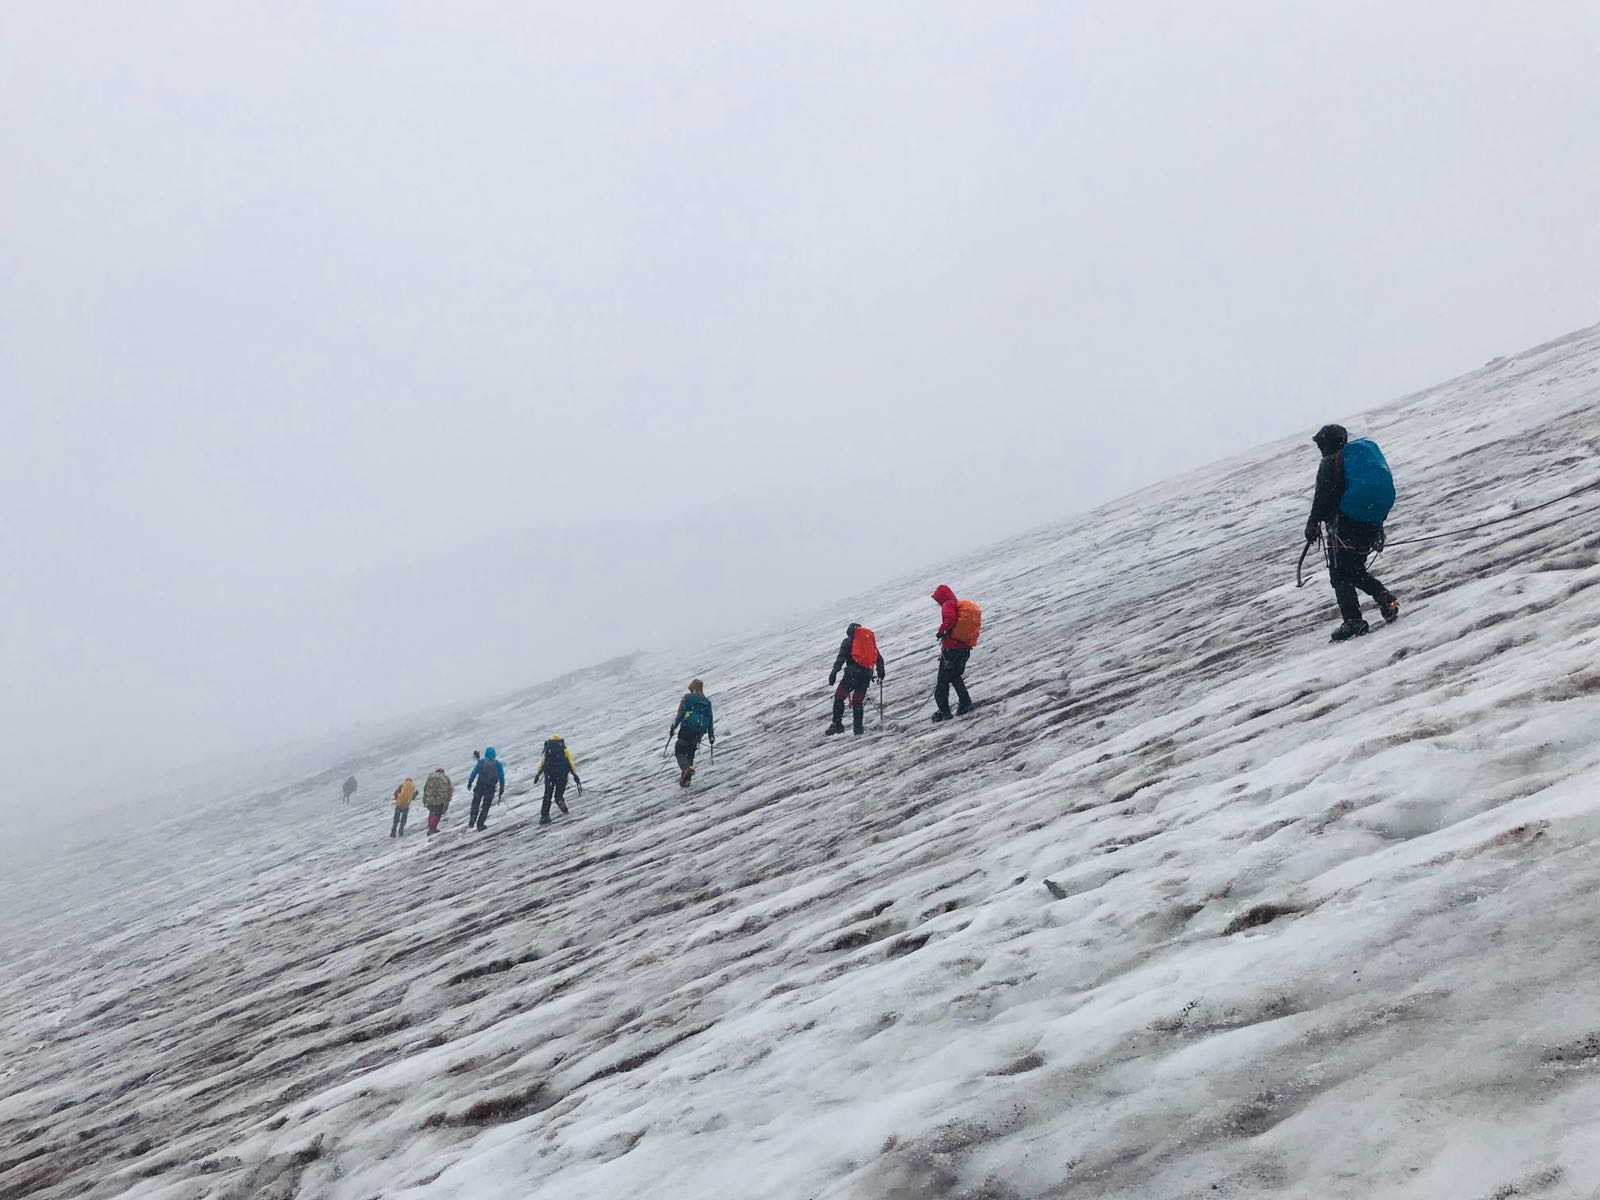 İler Kar-Buz Eğitimi A Kampı Rize/Kazbek'te düzenlendi.